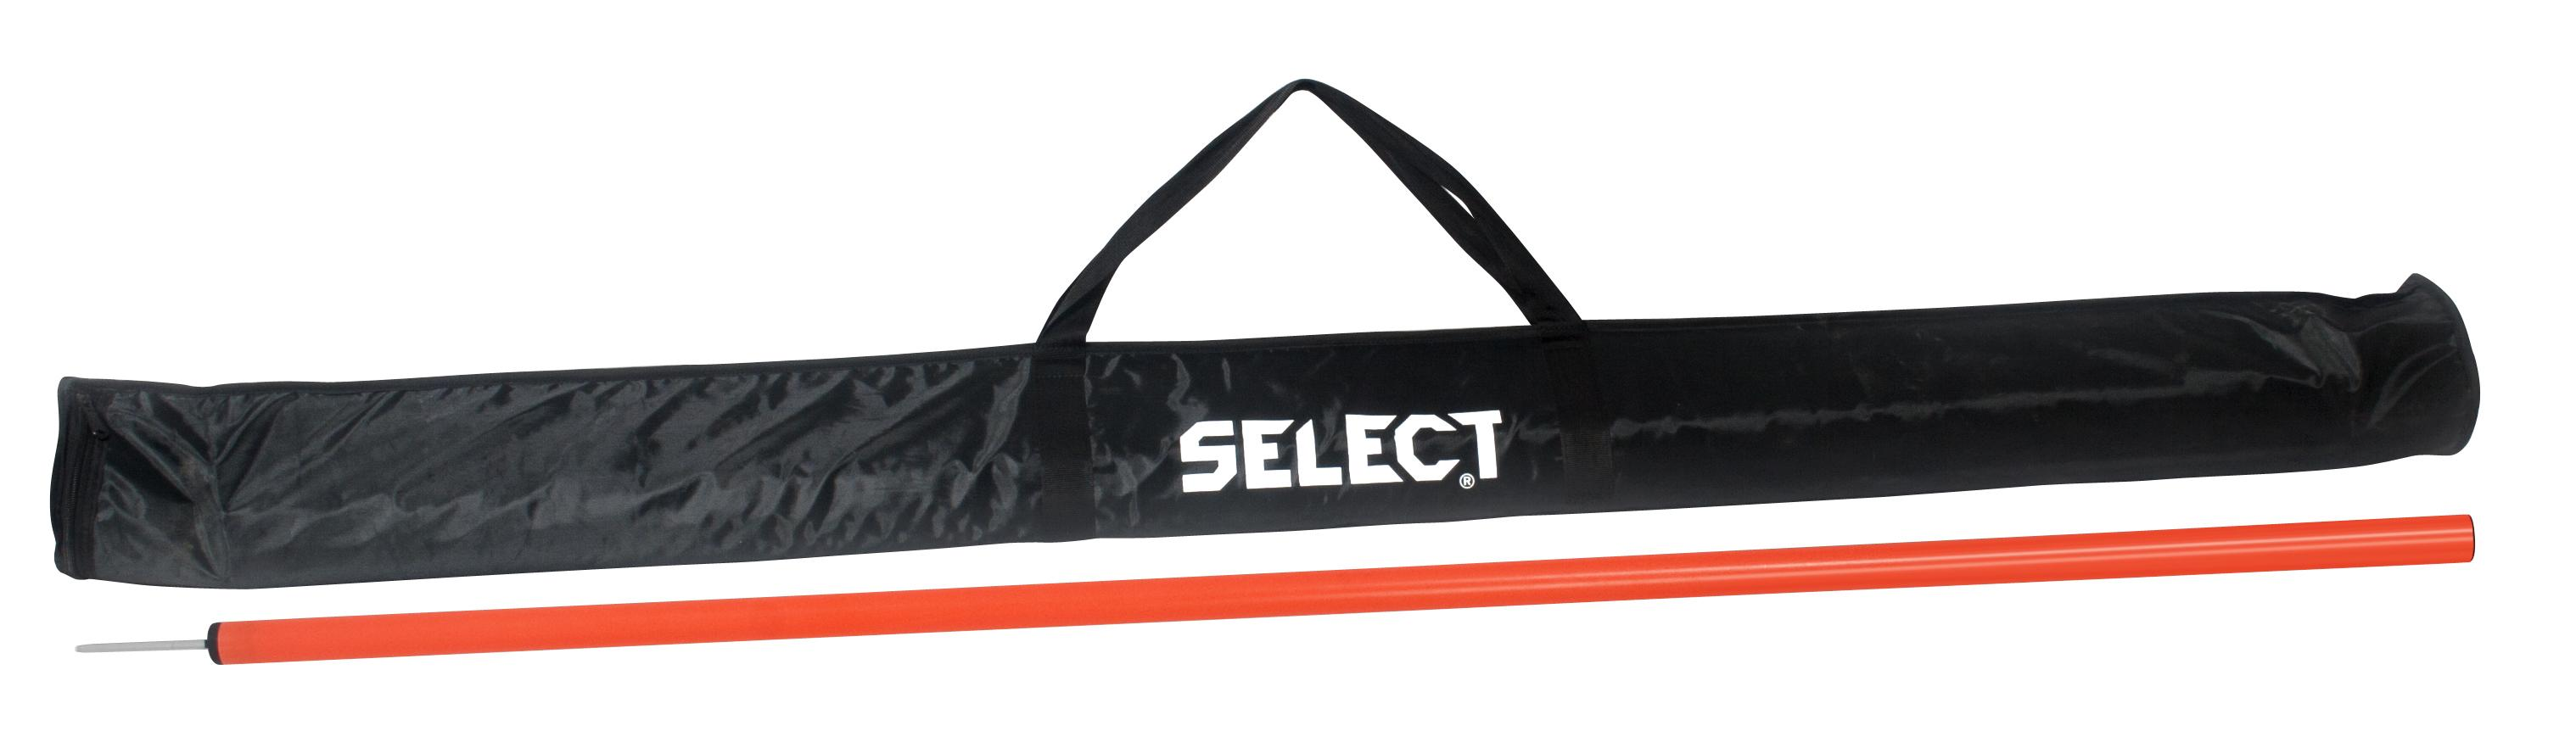 Select Väska Til Stång